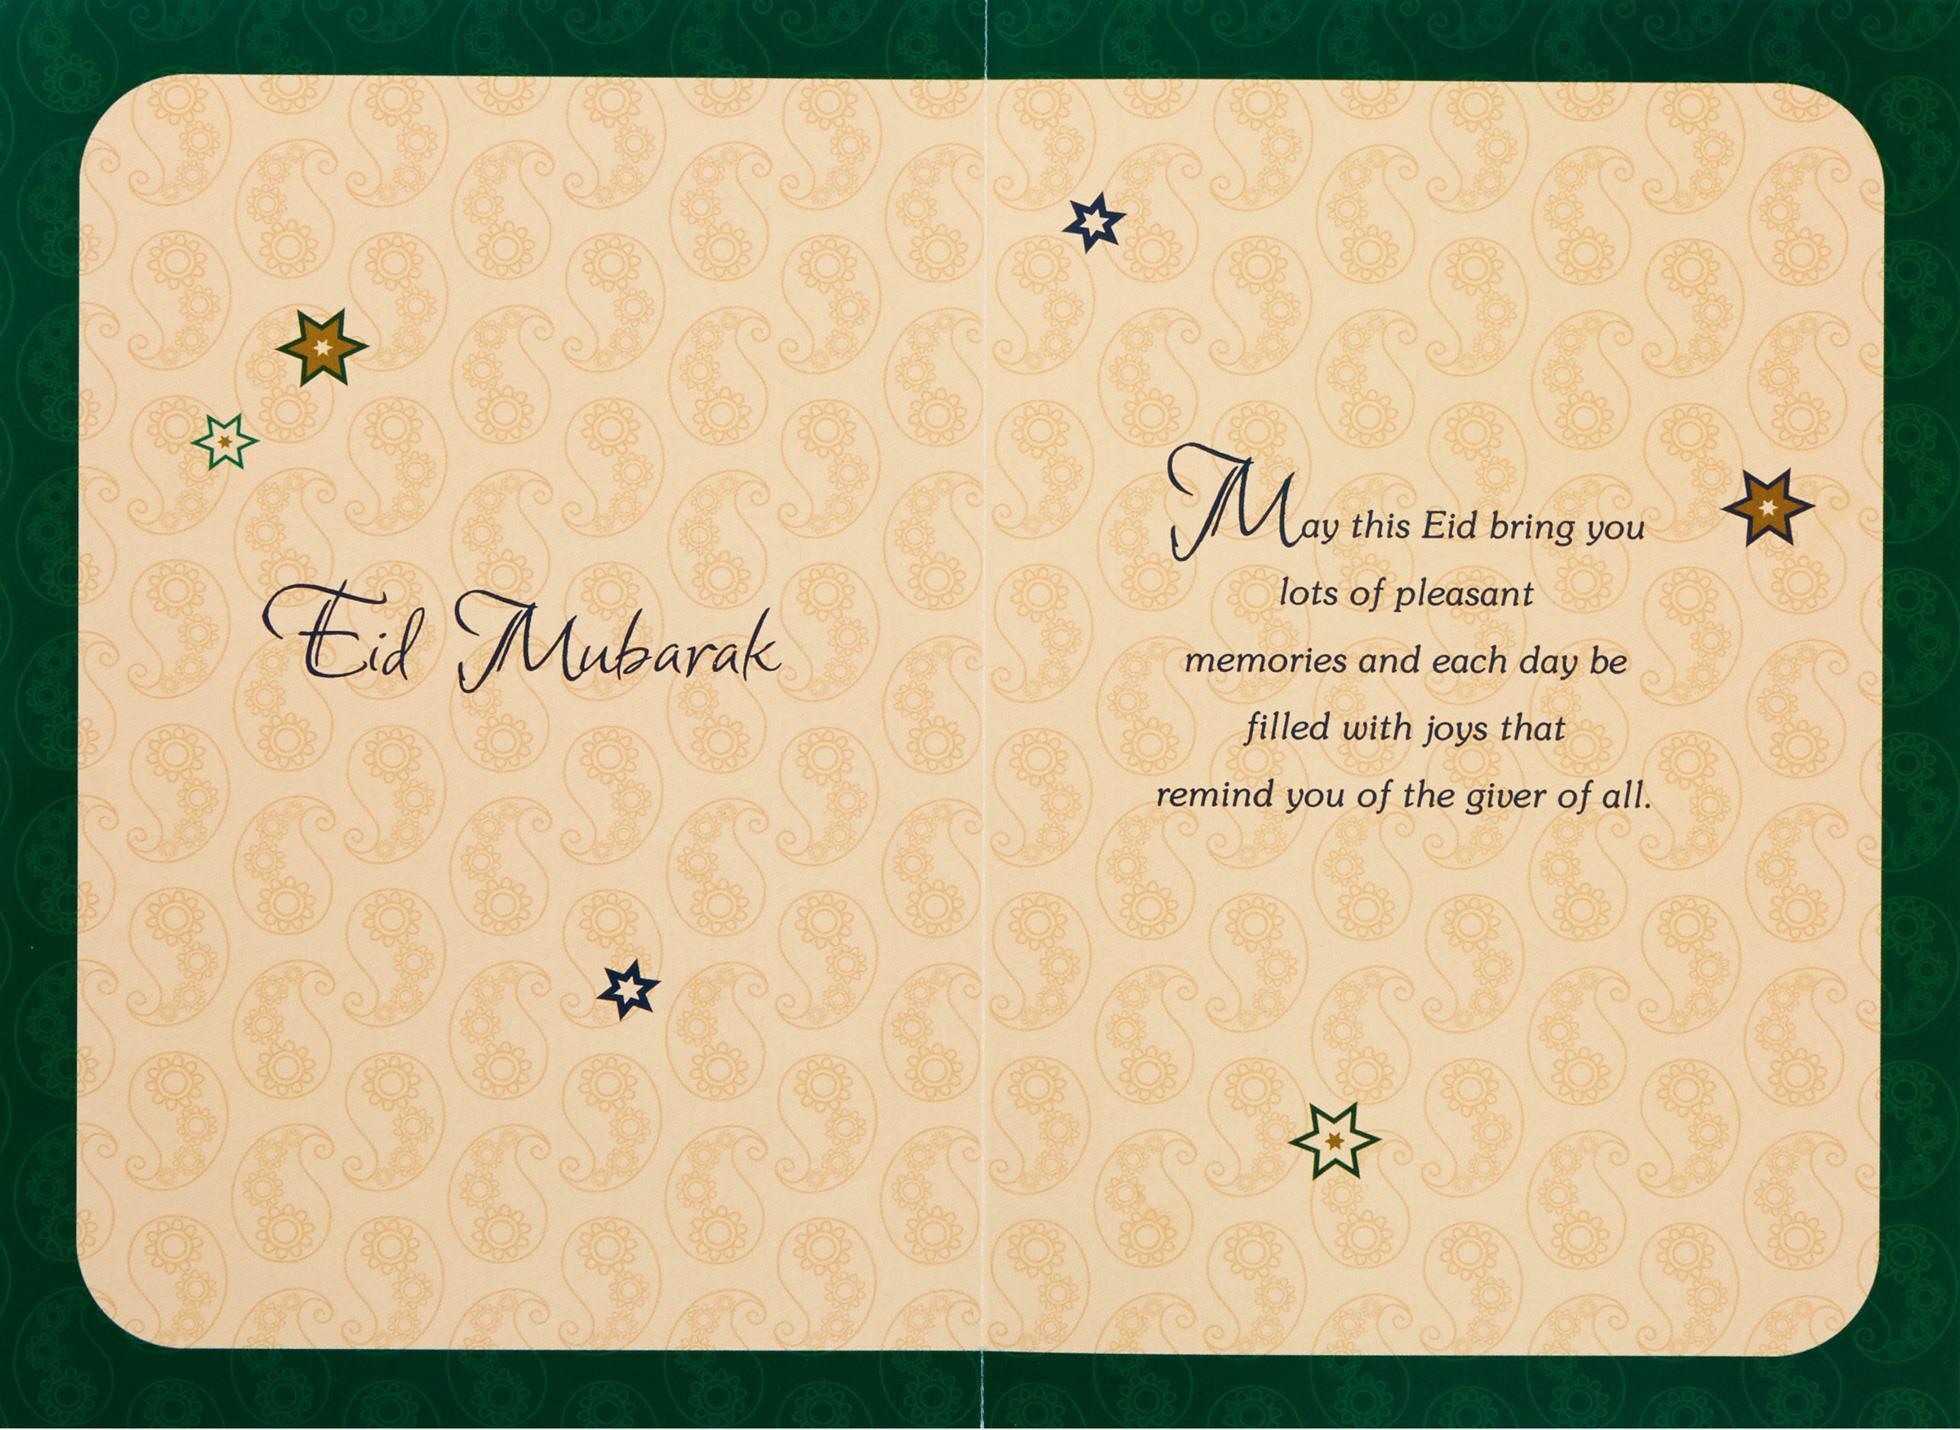 Amazing Formal Eid Al-Fitr Greeting - Paisley-and-Stars-Eid-alFitr-Card-root-499ETH1056_PV  Snapshot_492375 .jpg?sw\u003d512\u0026sh\u003d512\u0026sm\u003dfit